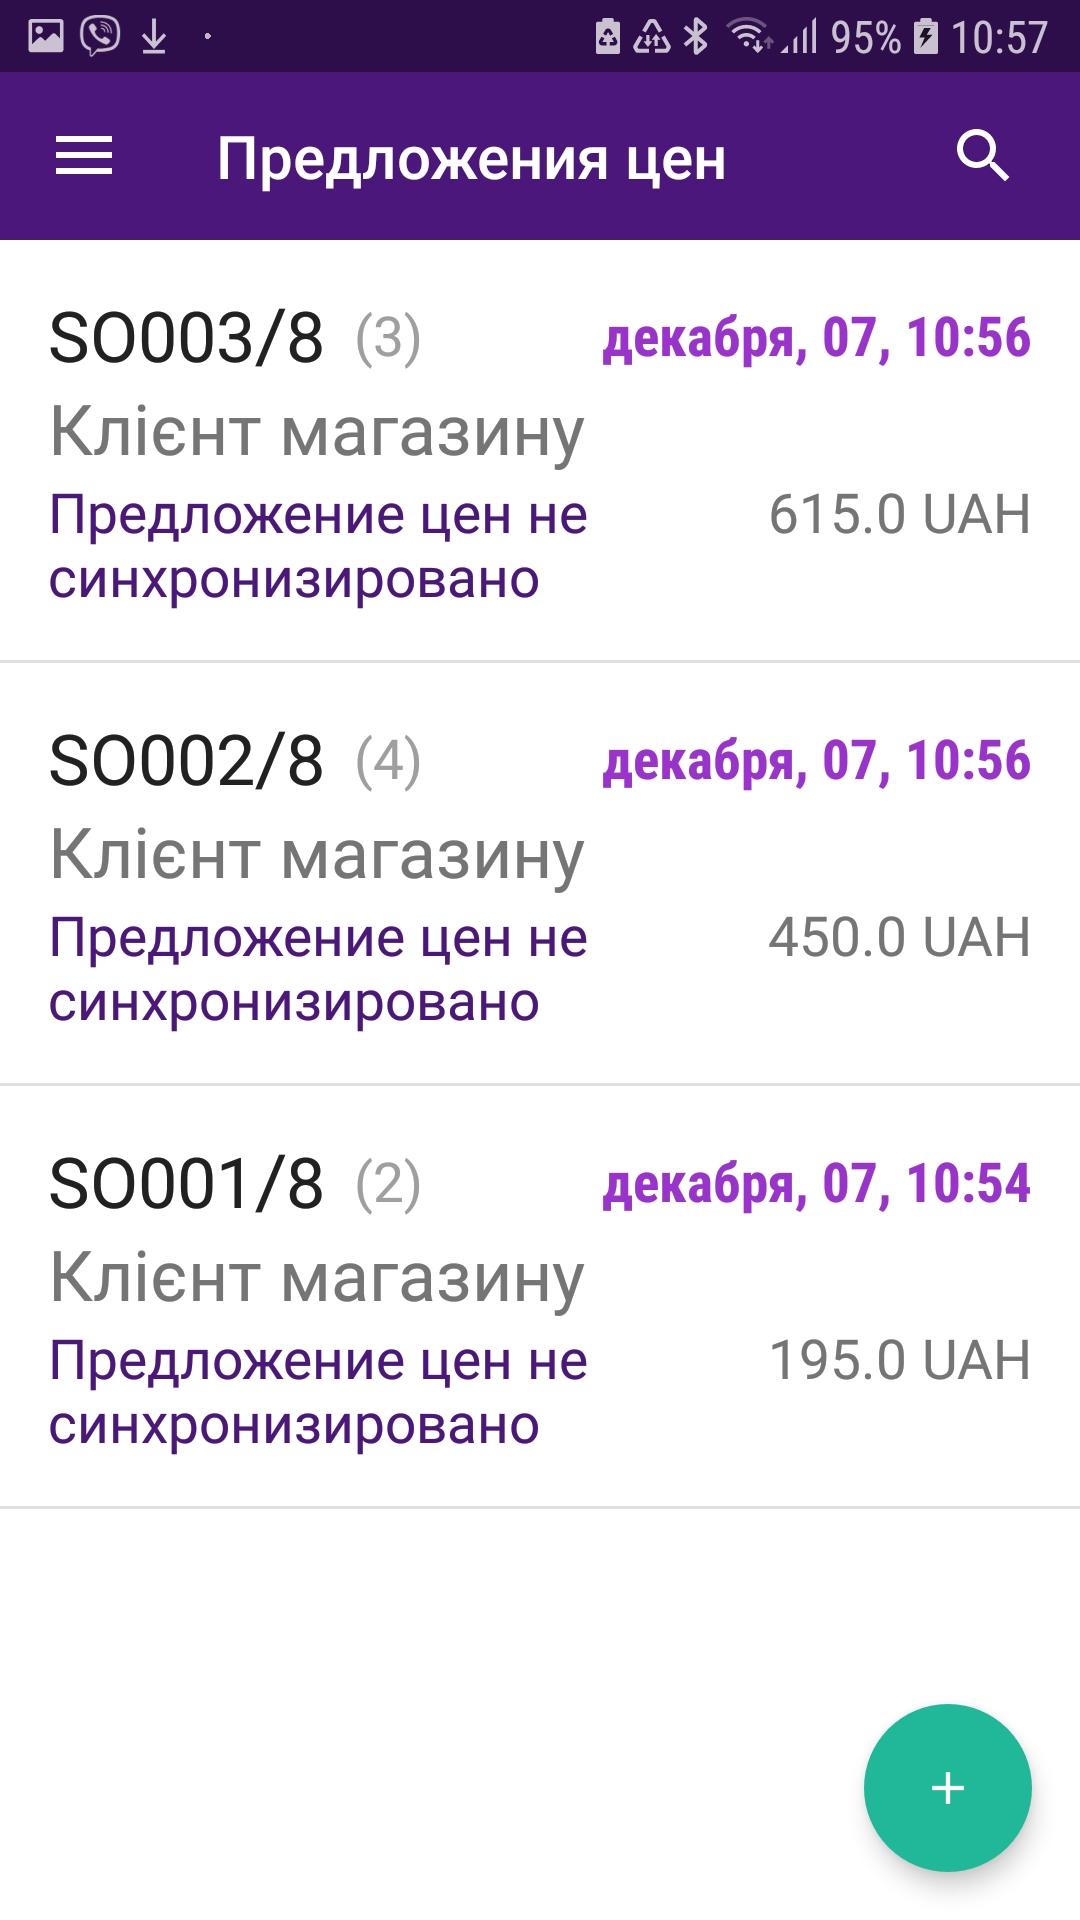 Список предложений цен